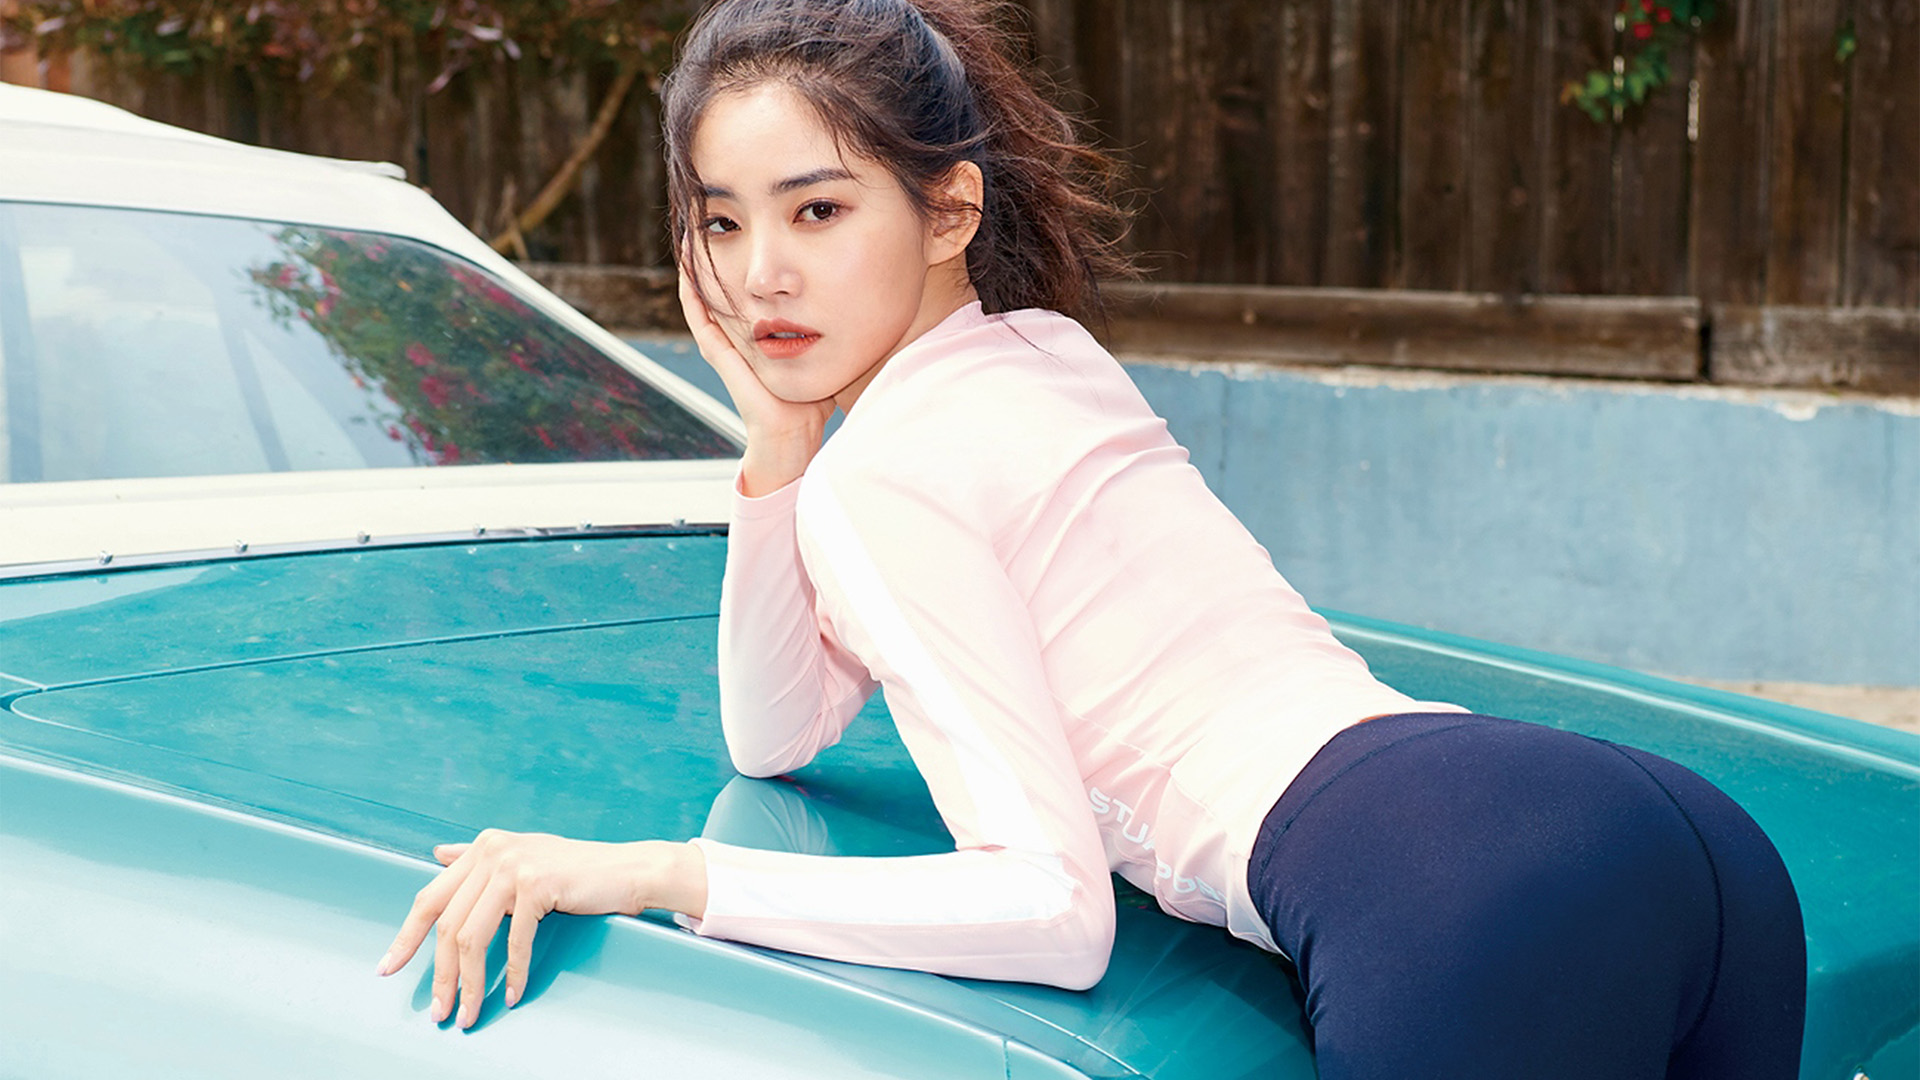 Cute Winter Girl Wallpaper Hq68 Girl Korean Film Actress Wallpaper